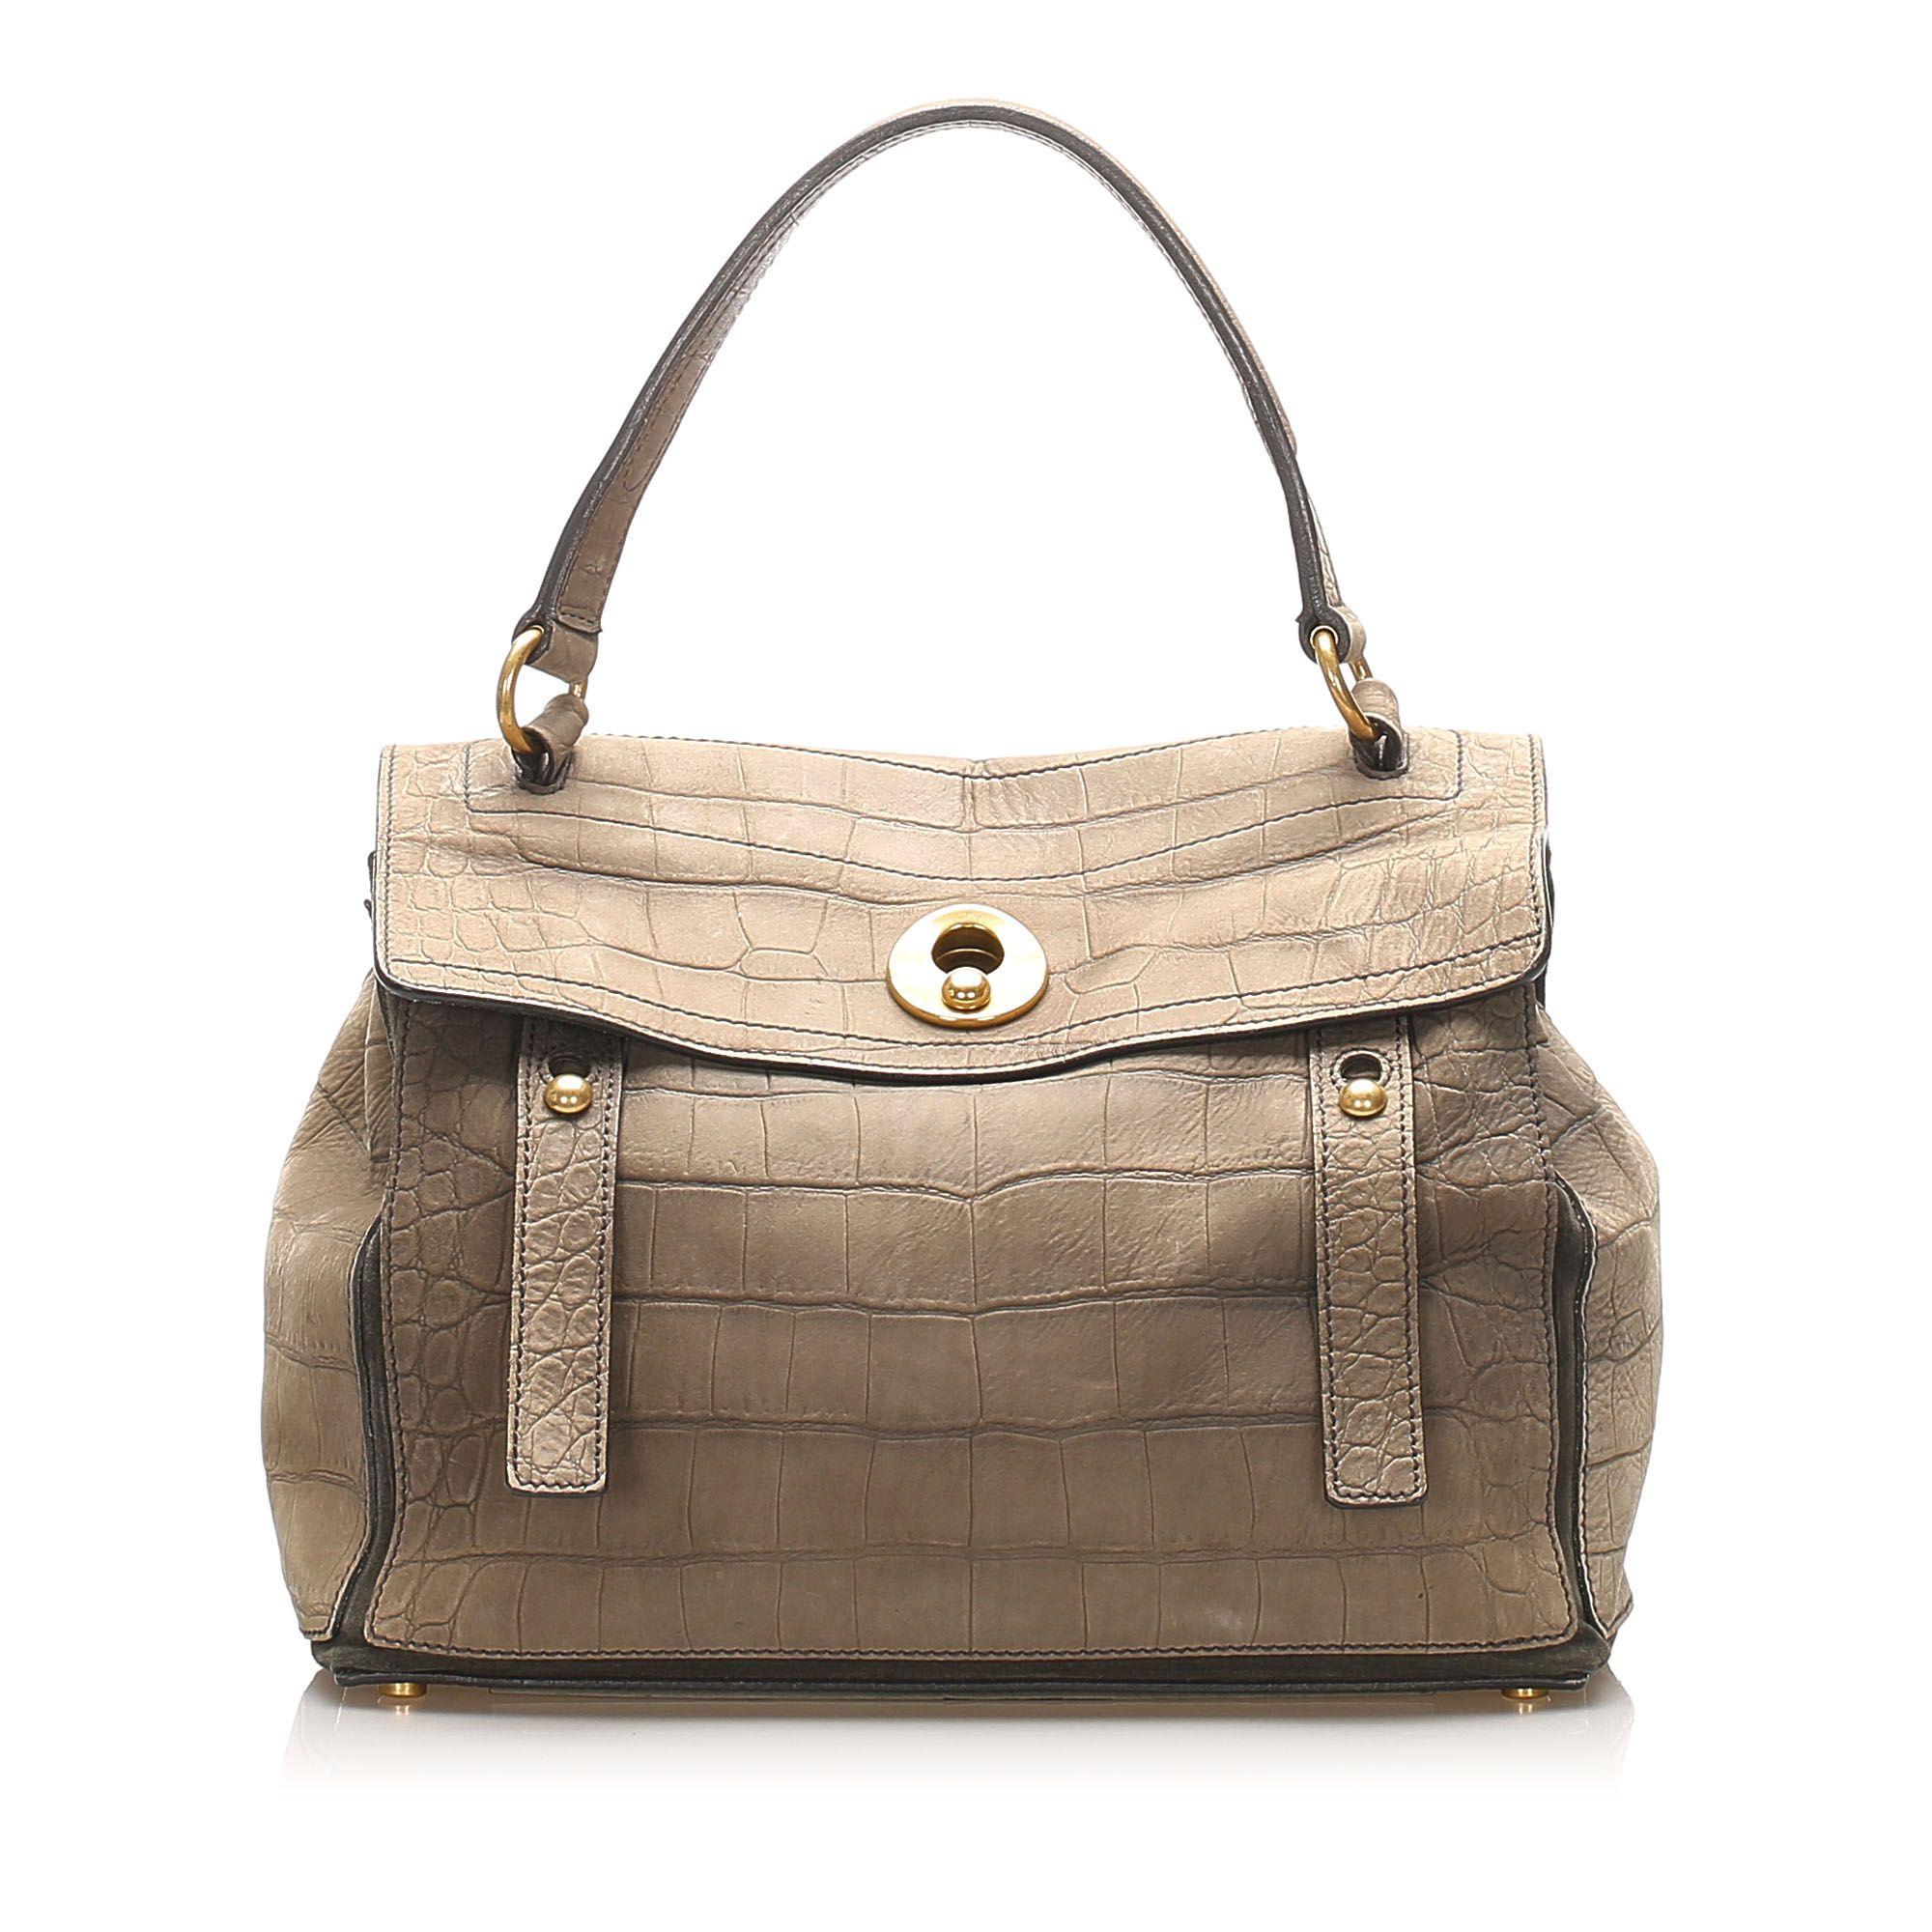 Vintage YSL Muse Two Leather Handbag Brown